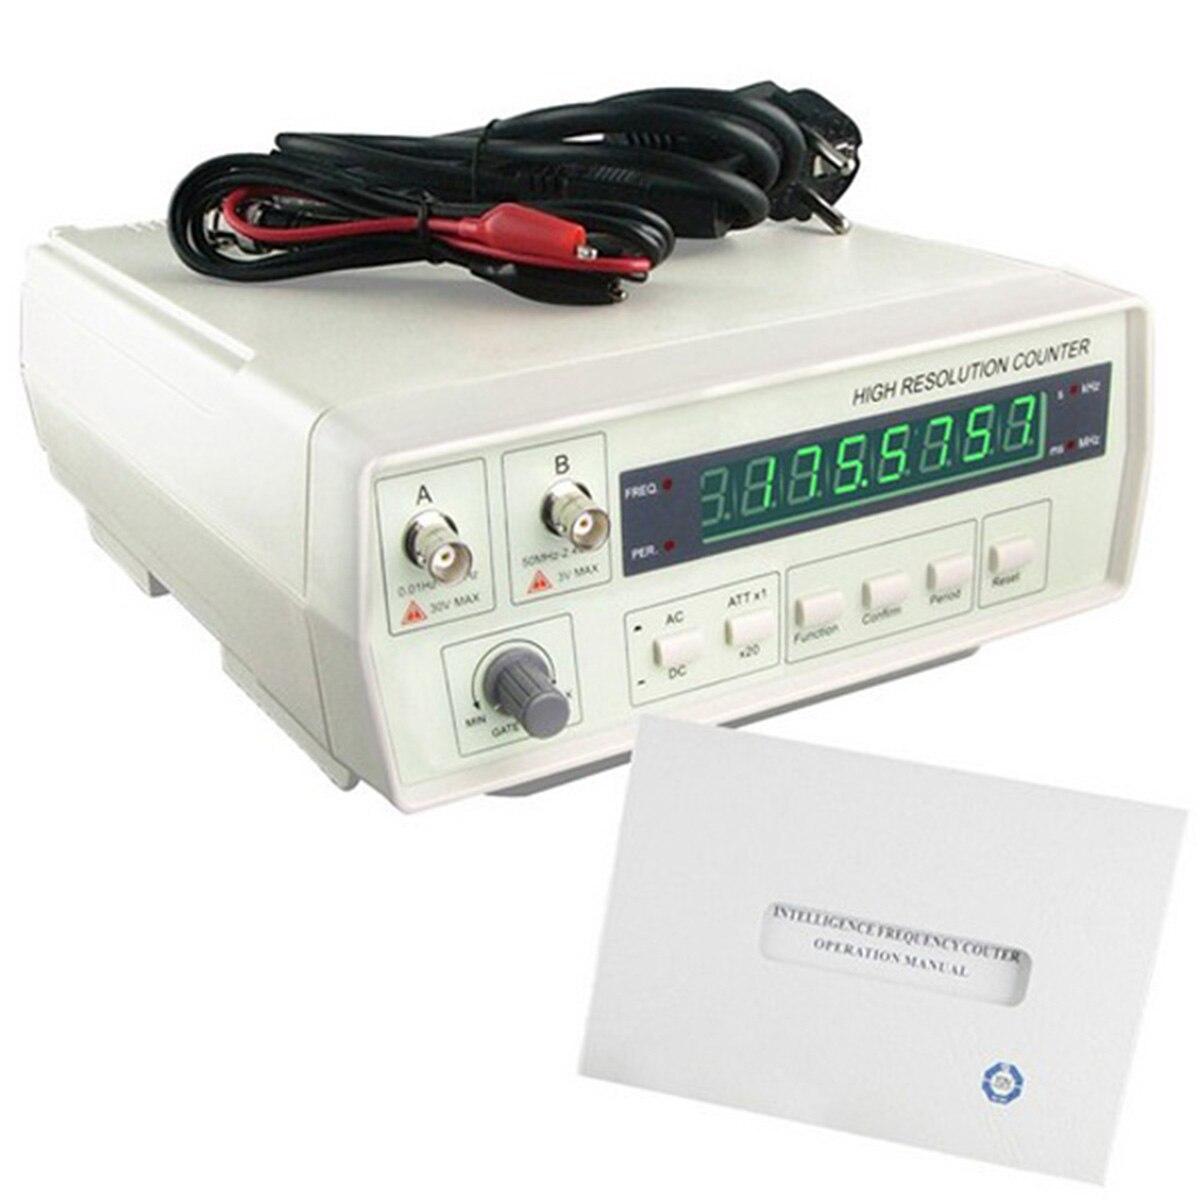 VC3165 110V-220V Professional Precision Frequency Counter MeterVC3165 110V-220V Professional Precision Frequency Counter Meter